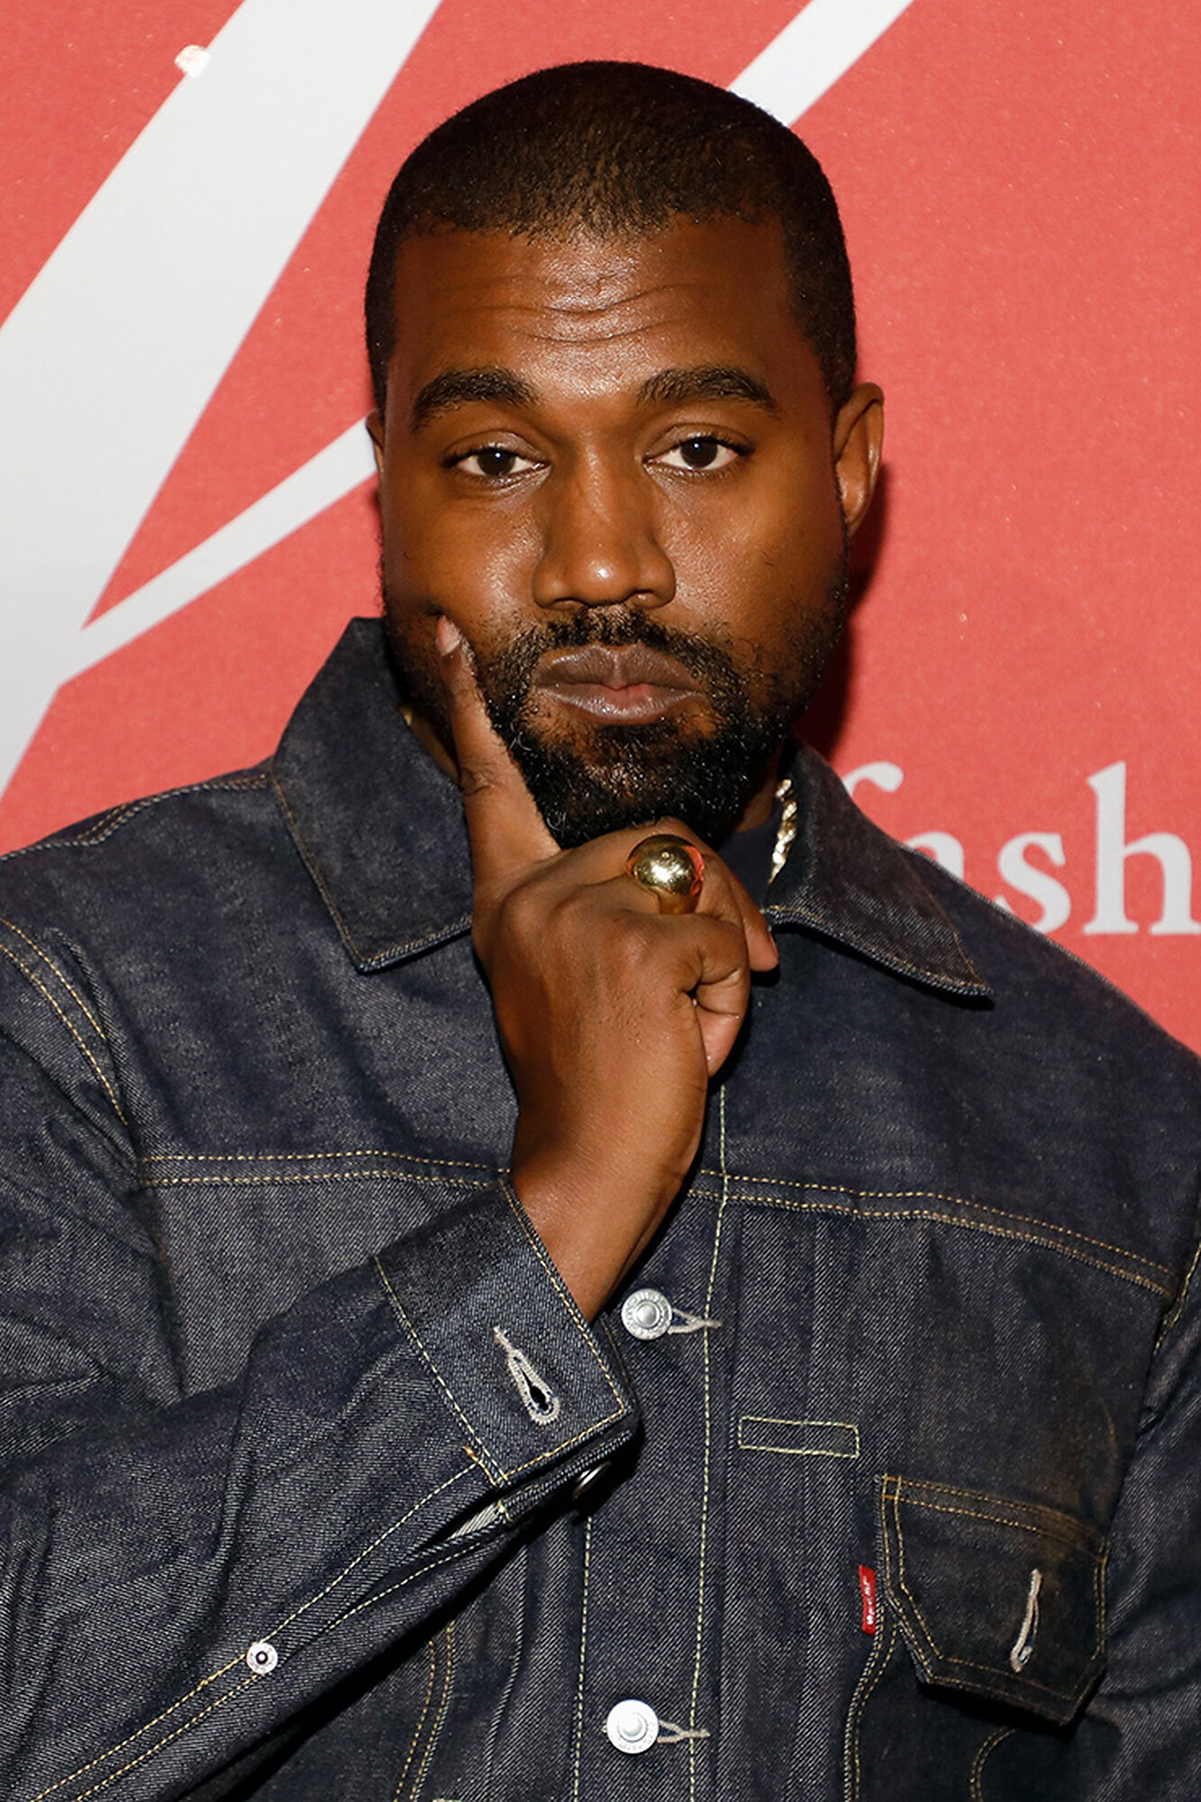 Kanye West unfollowed Kim Kardashian